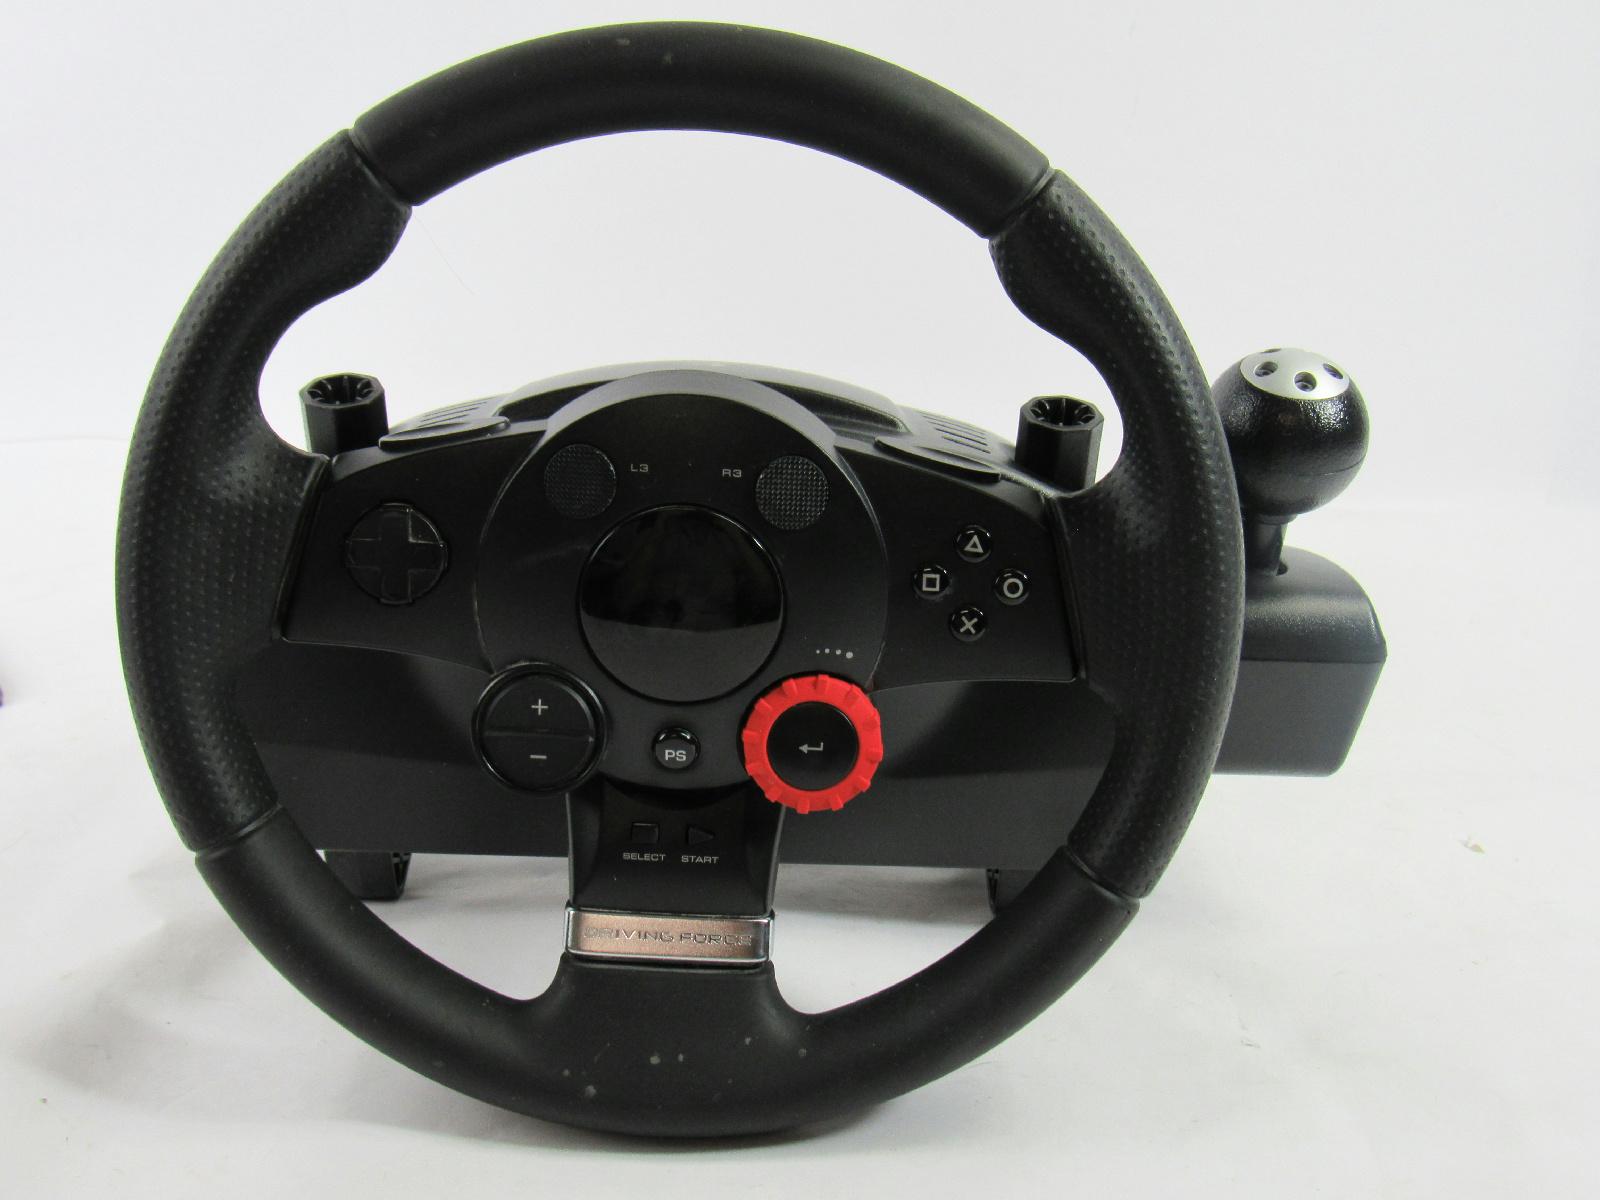 steering wheel pc 2006 dodge ram trailer wiring diagram driving force gt ps3 gaming